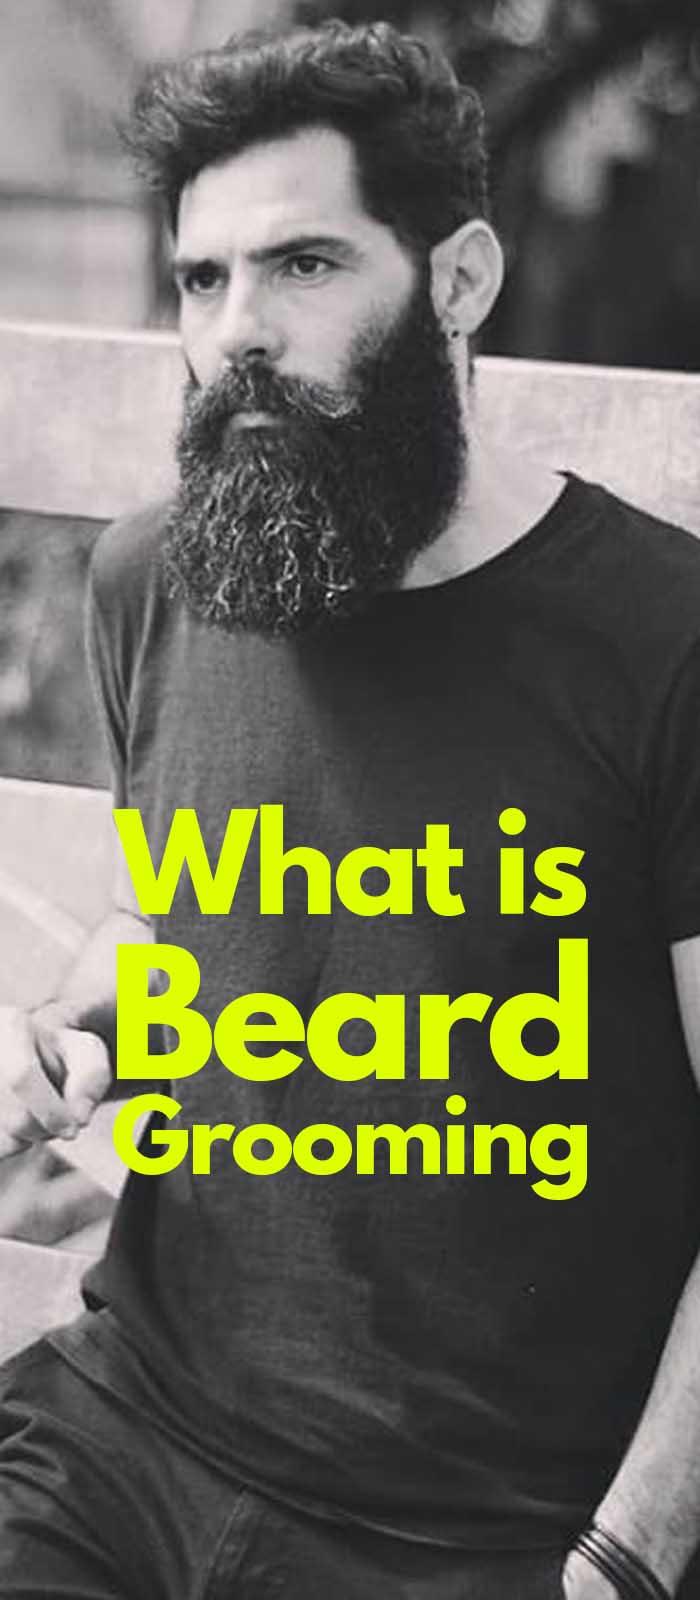 Beard Grooming!